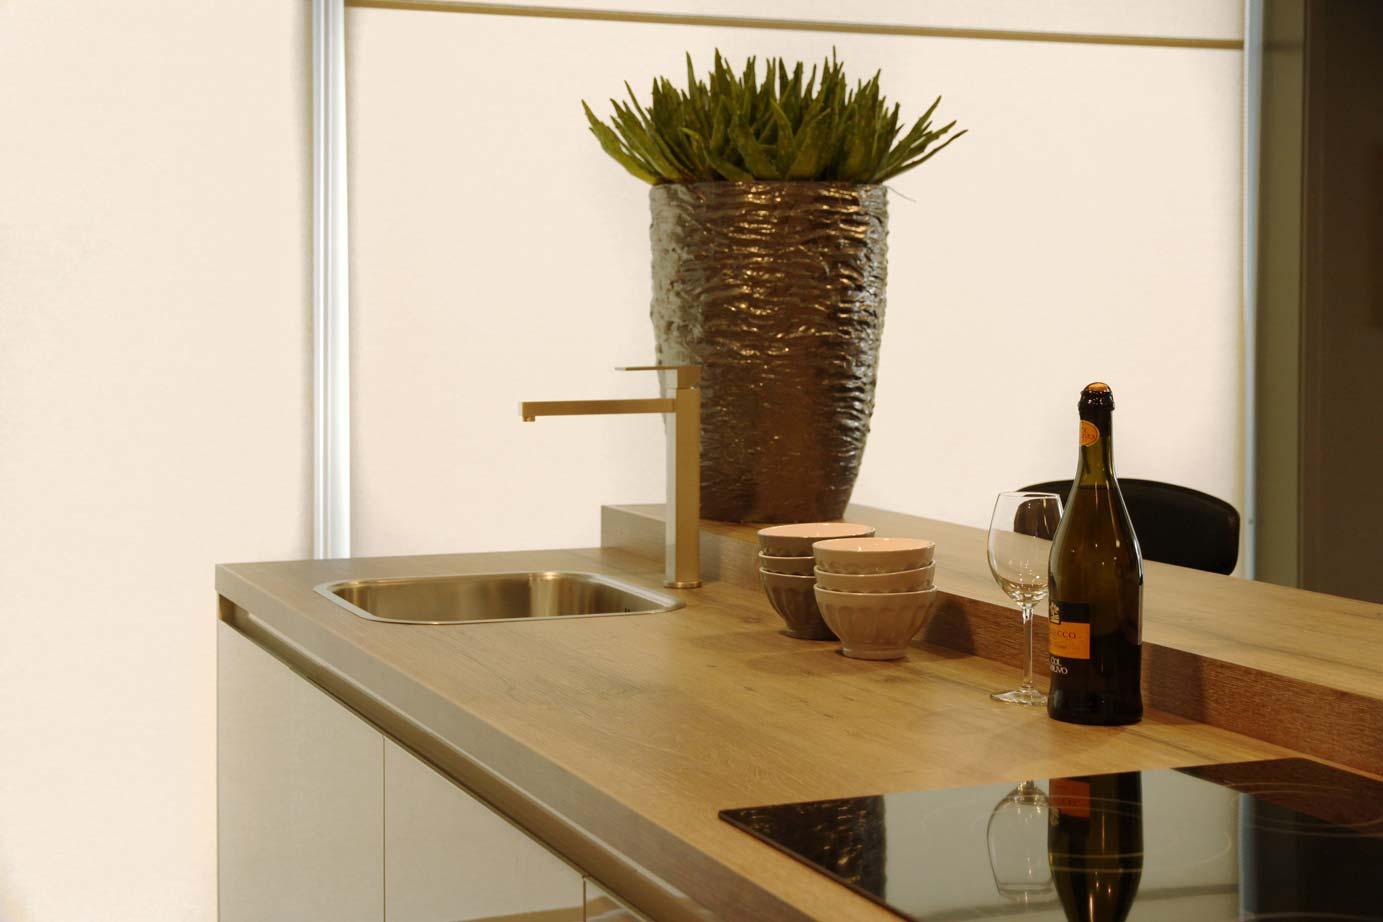 Keuken Met Kookeiland Te Koop : Keuken met kookeiland. Old Wood-beleving. – DB Keukens